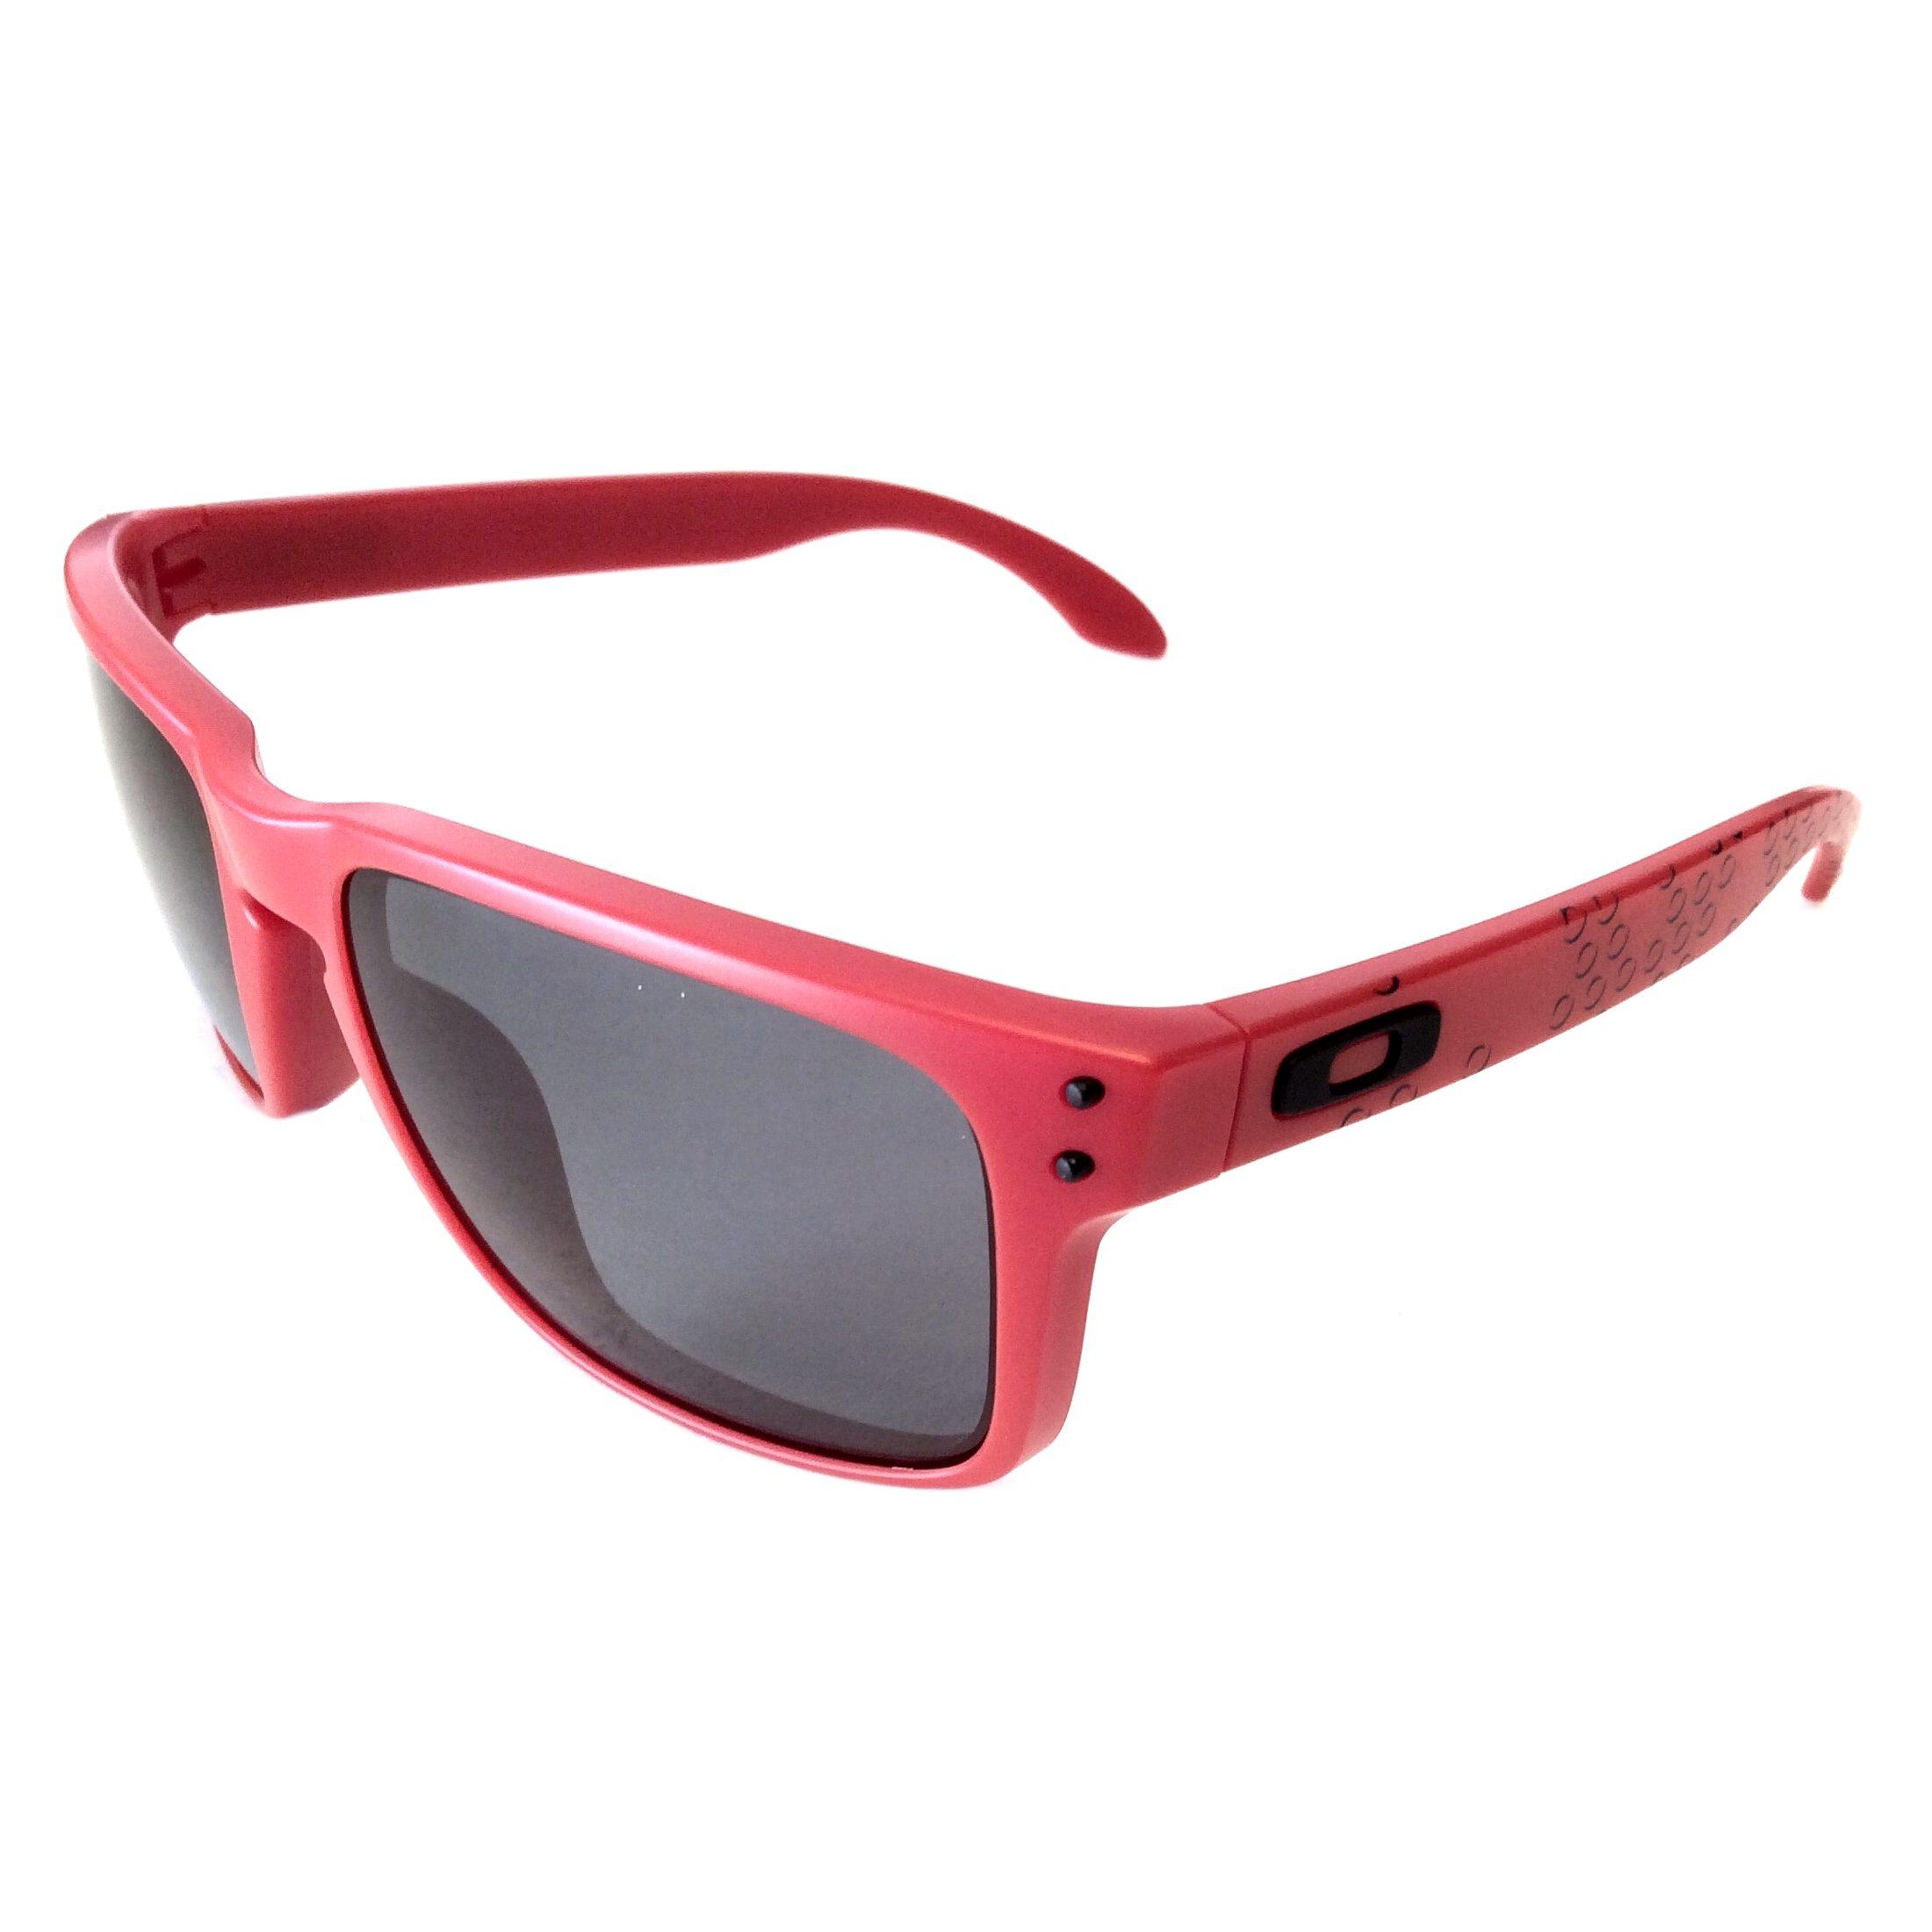 97e329100e779 Oakley Holbrook Sunglasses - B1B Collection Matte Red - Grey - OO9102-83